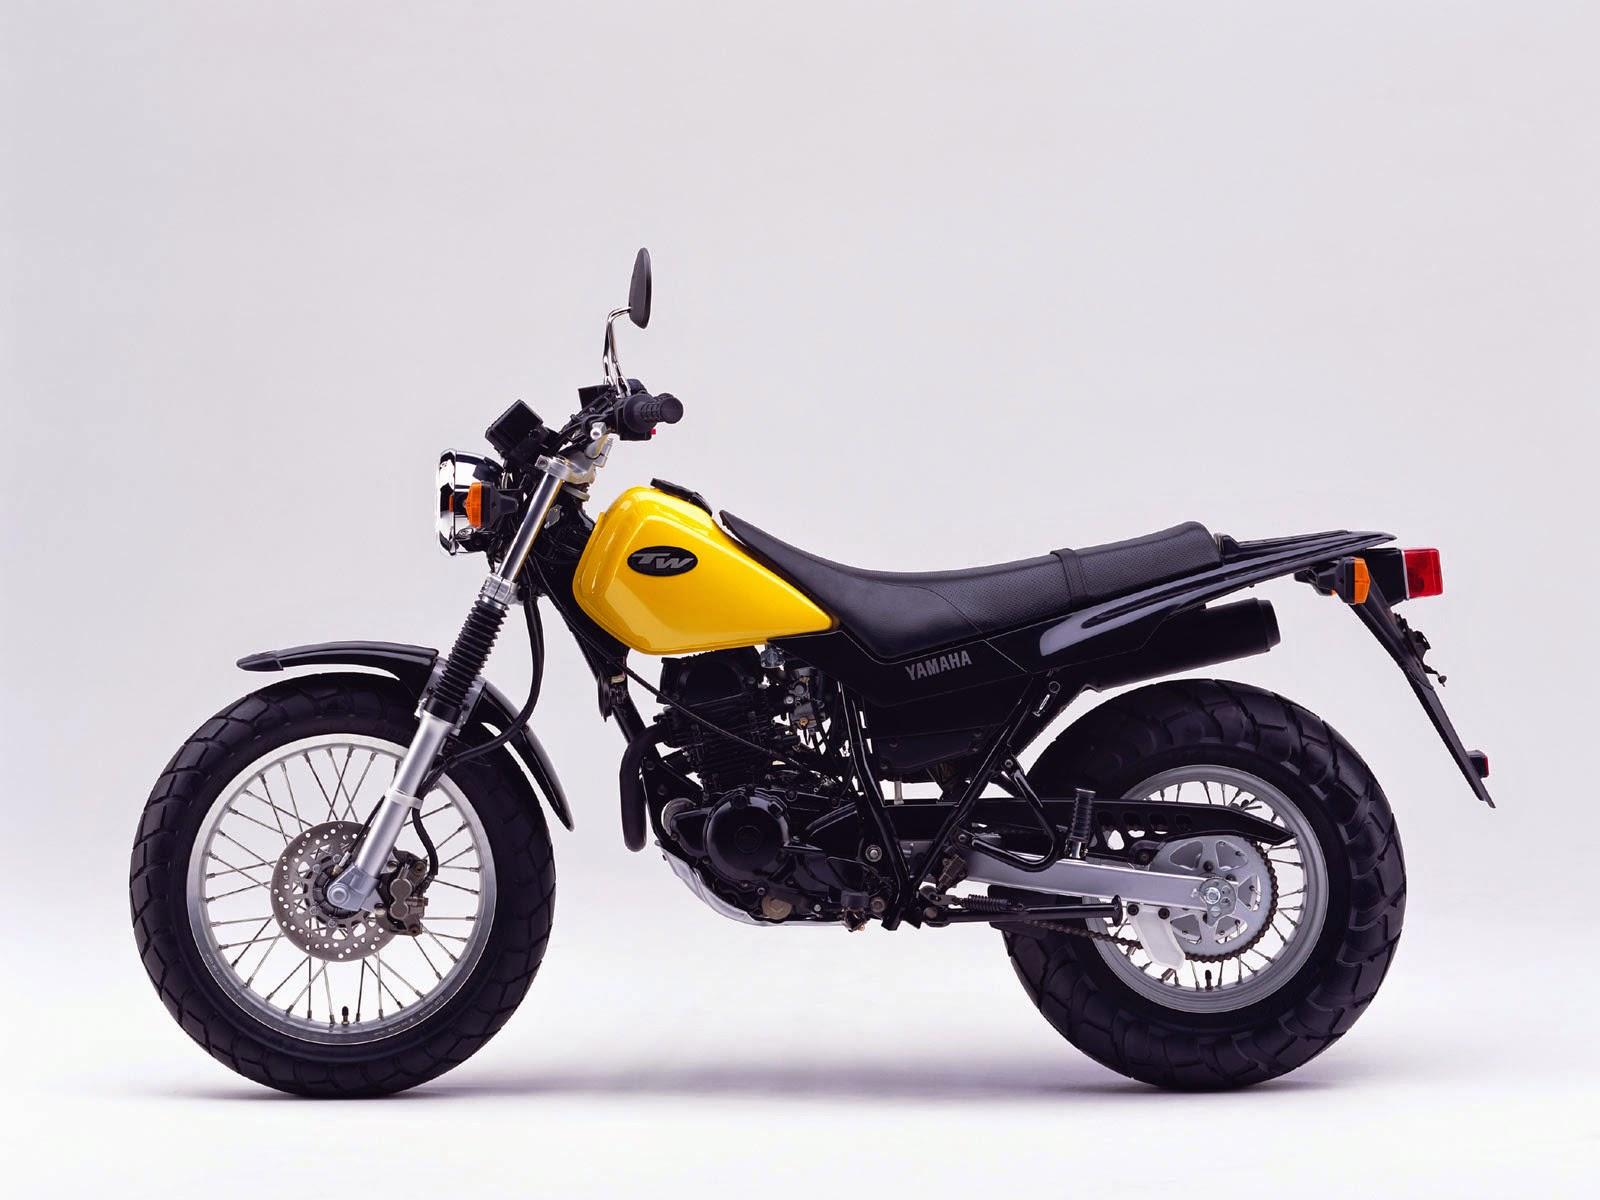 Modif Yamaha Fino